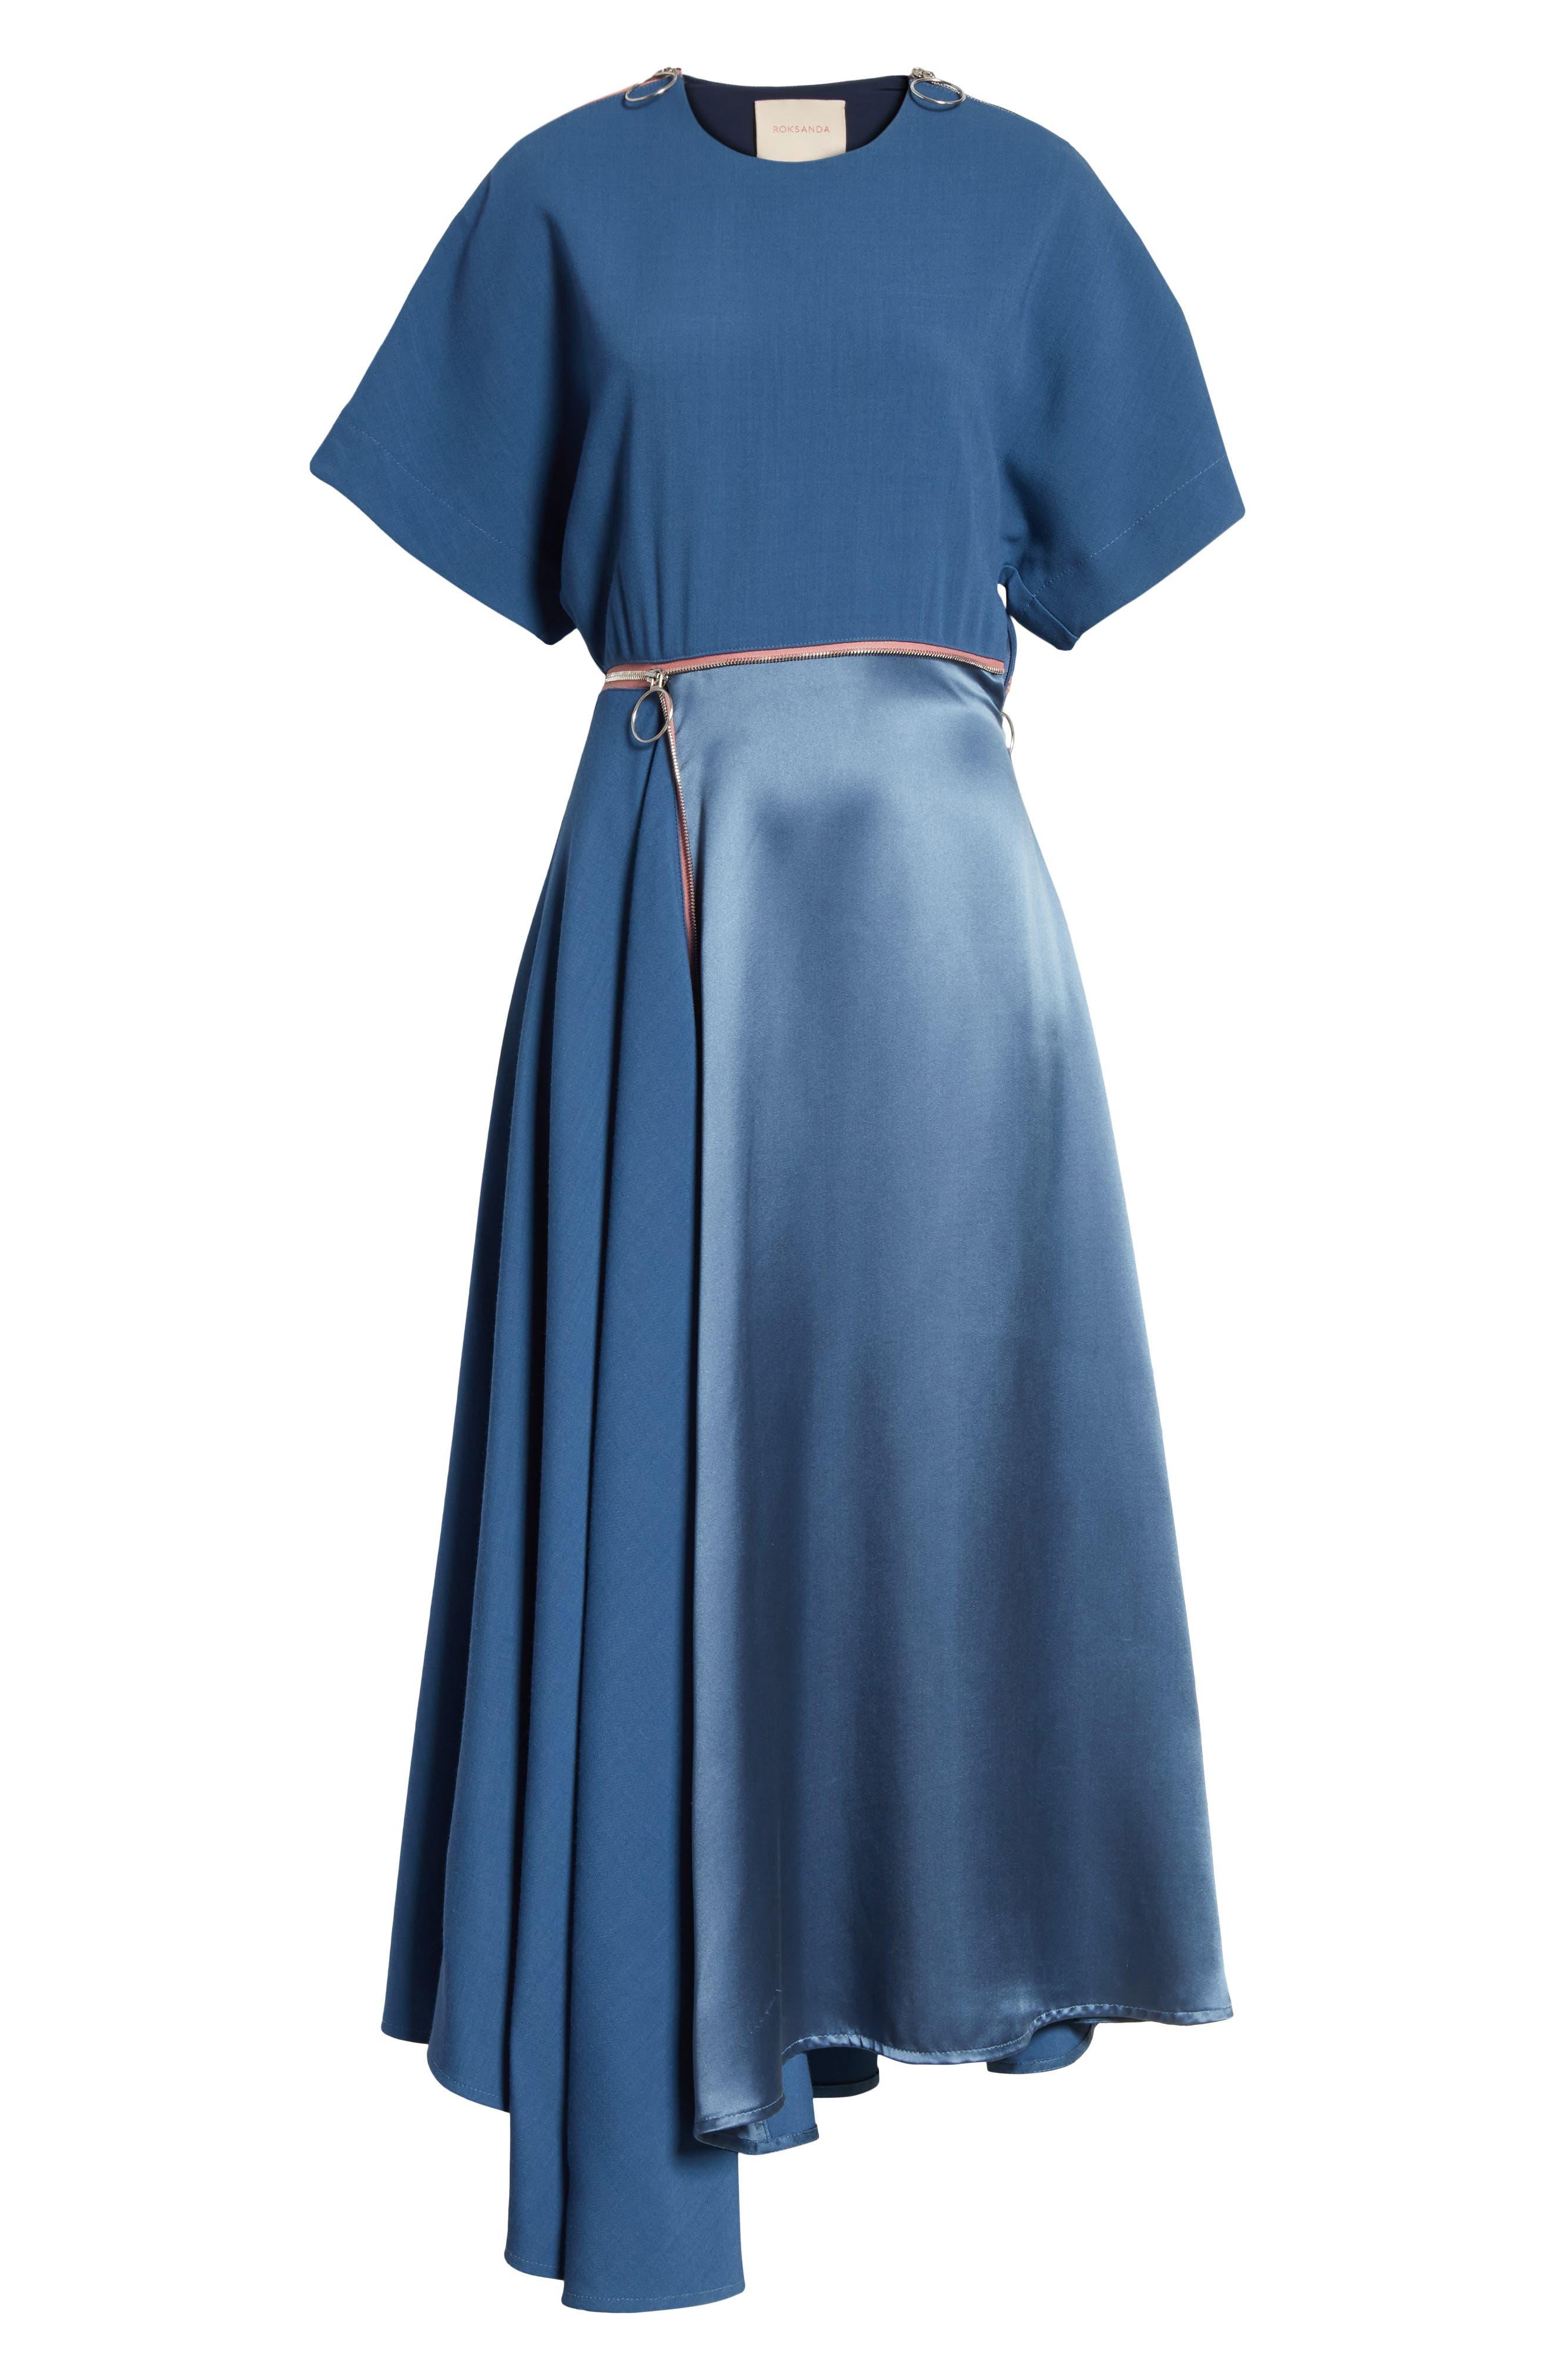 Gianna Asymmetrical Satin Dress,                             Alternate thumbnail 7, color,                             400